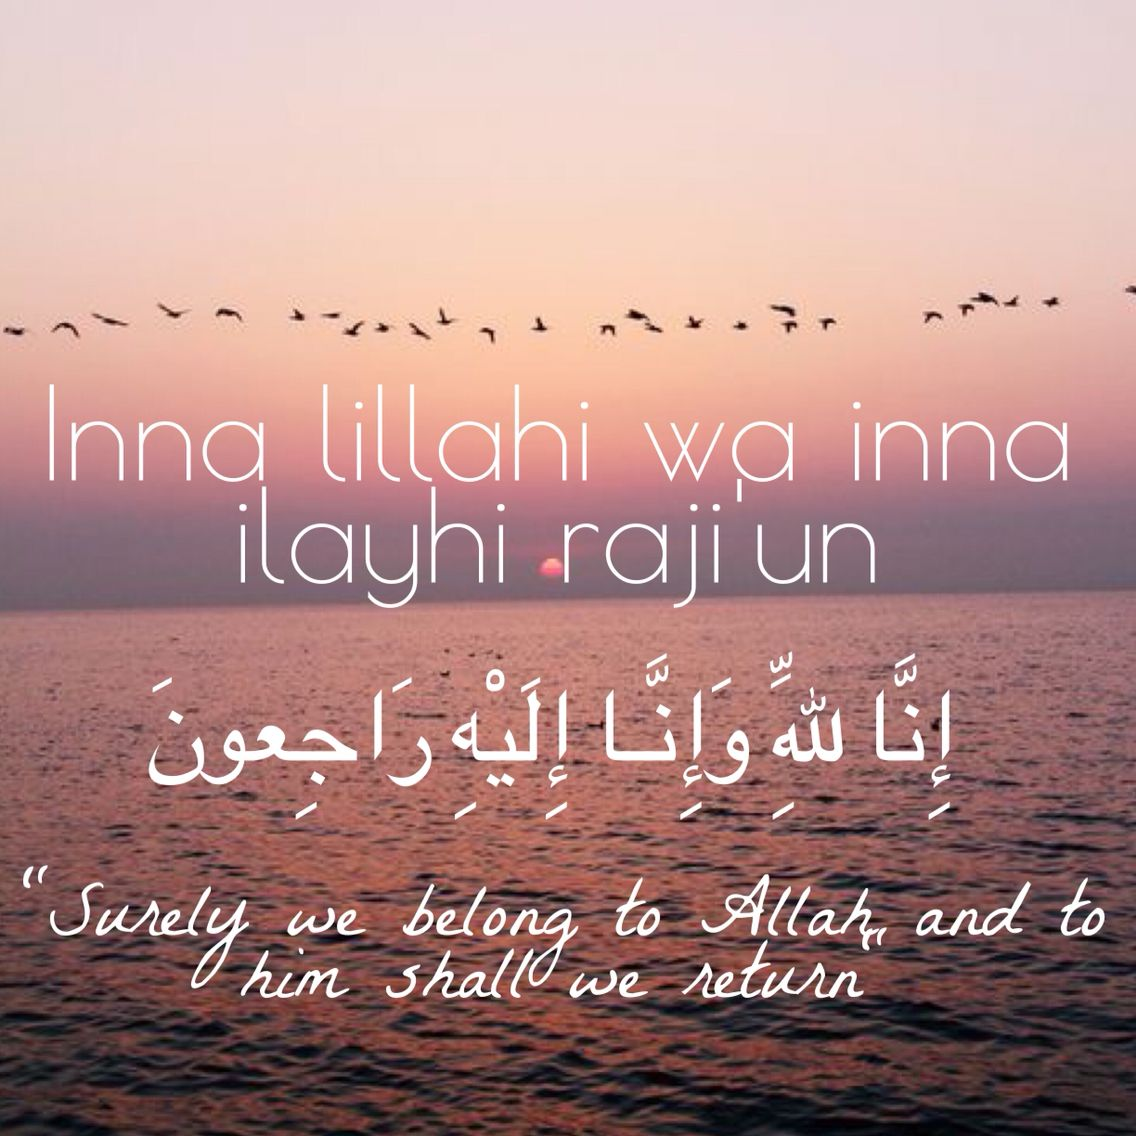 Islam Islam Et Message De Condoléances